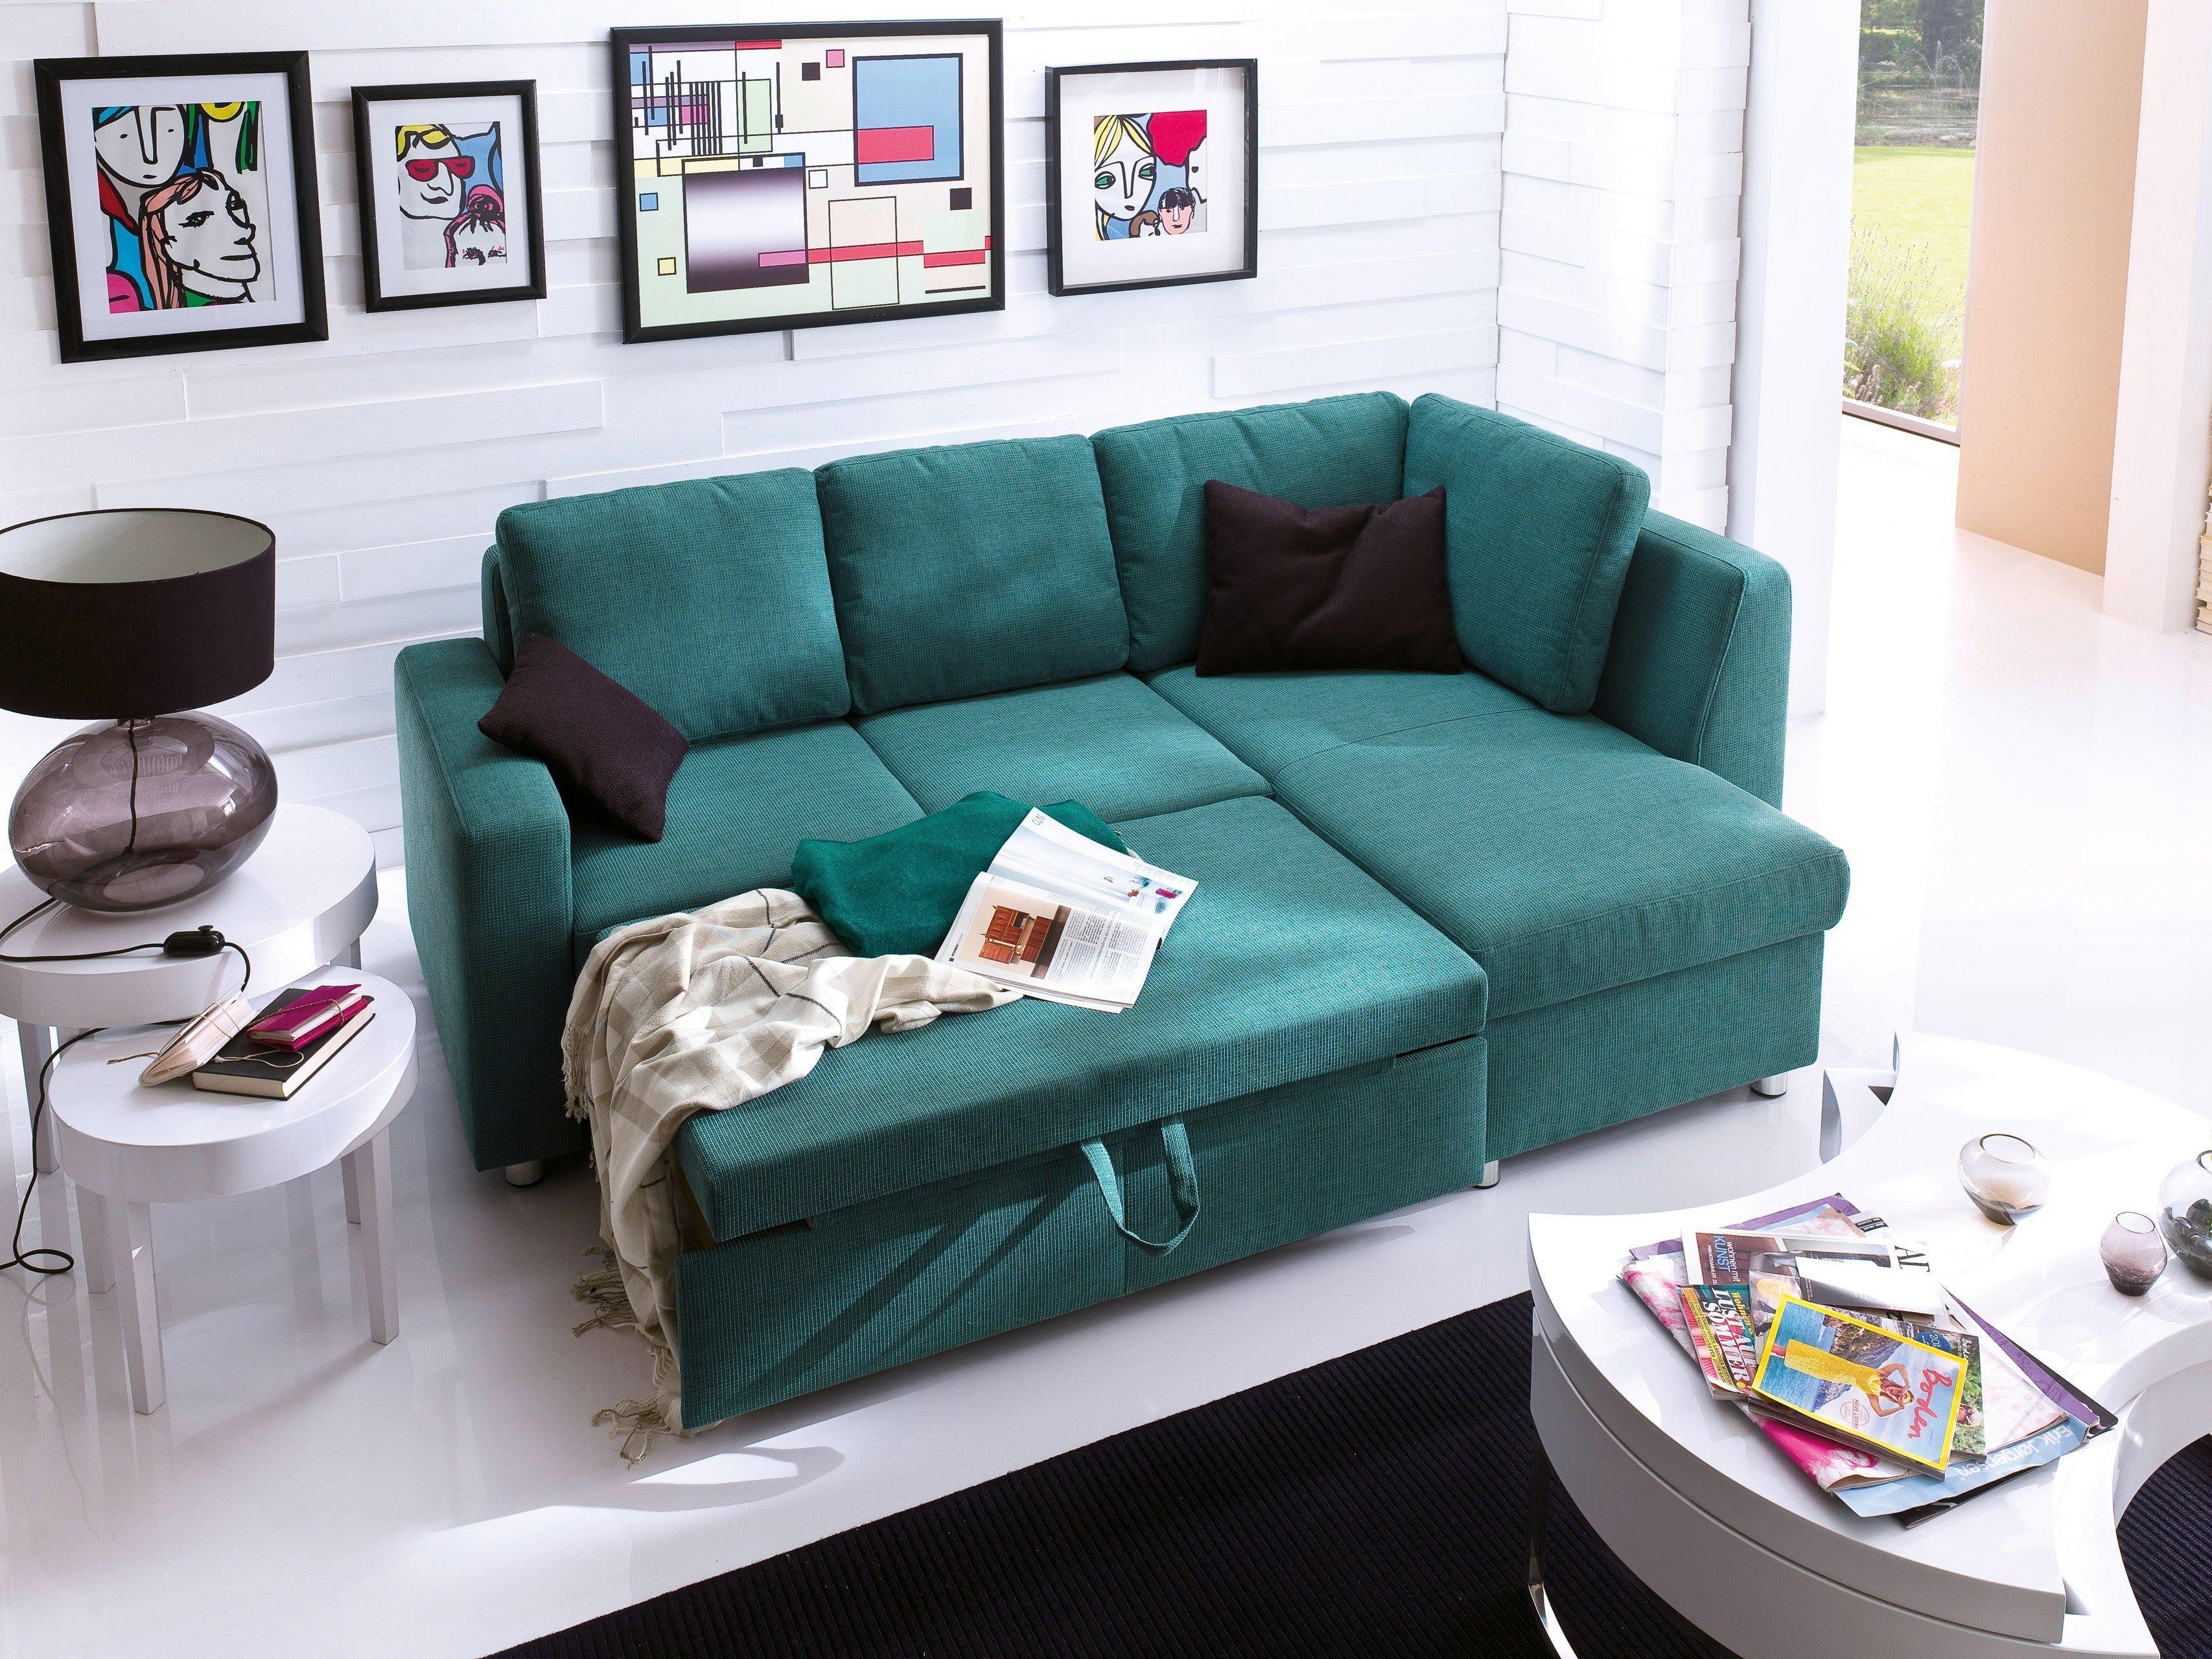 ecksofa poco dom ne inspirierendes design f r wohnm bel. Black Bedroom Furniture Sets. Home Design Ideas